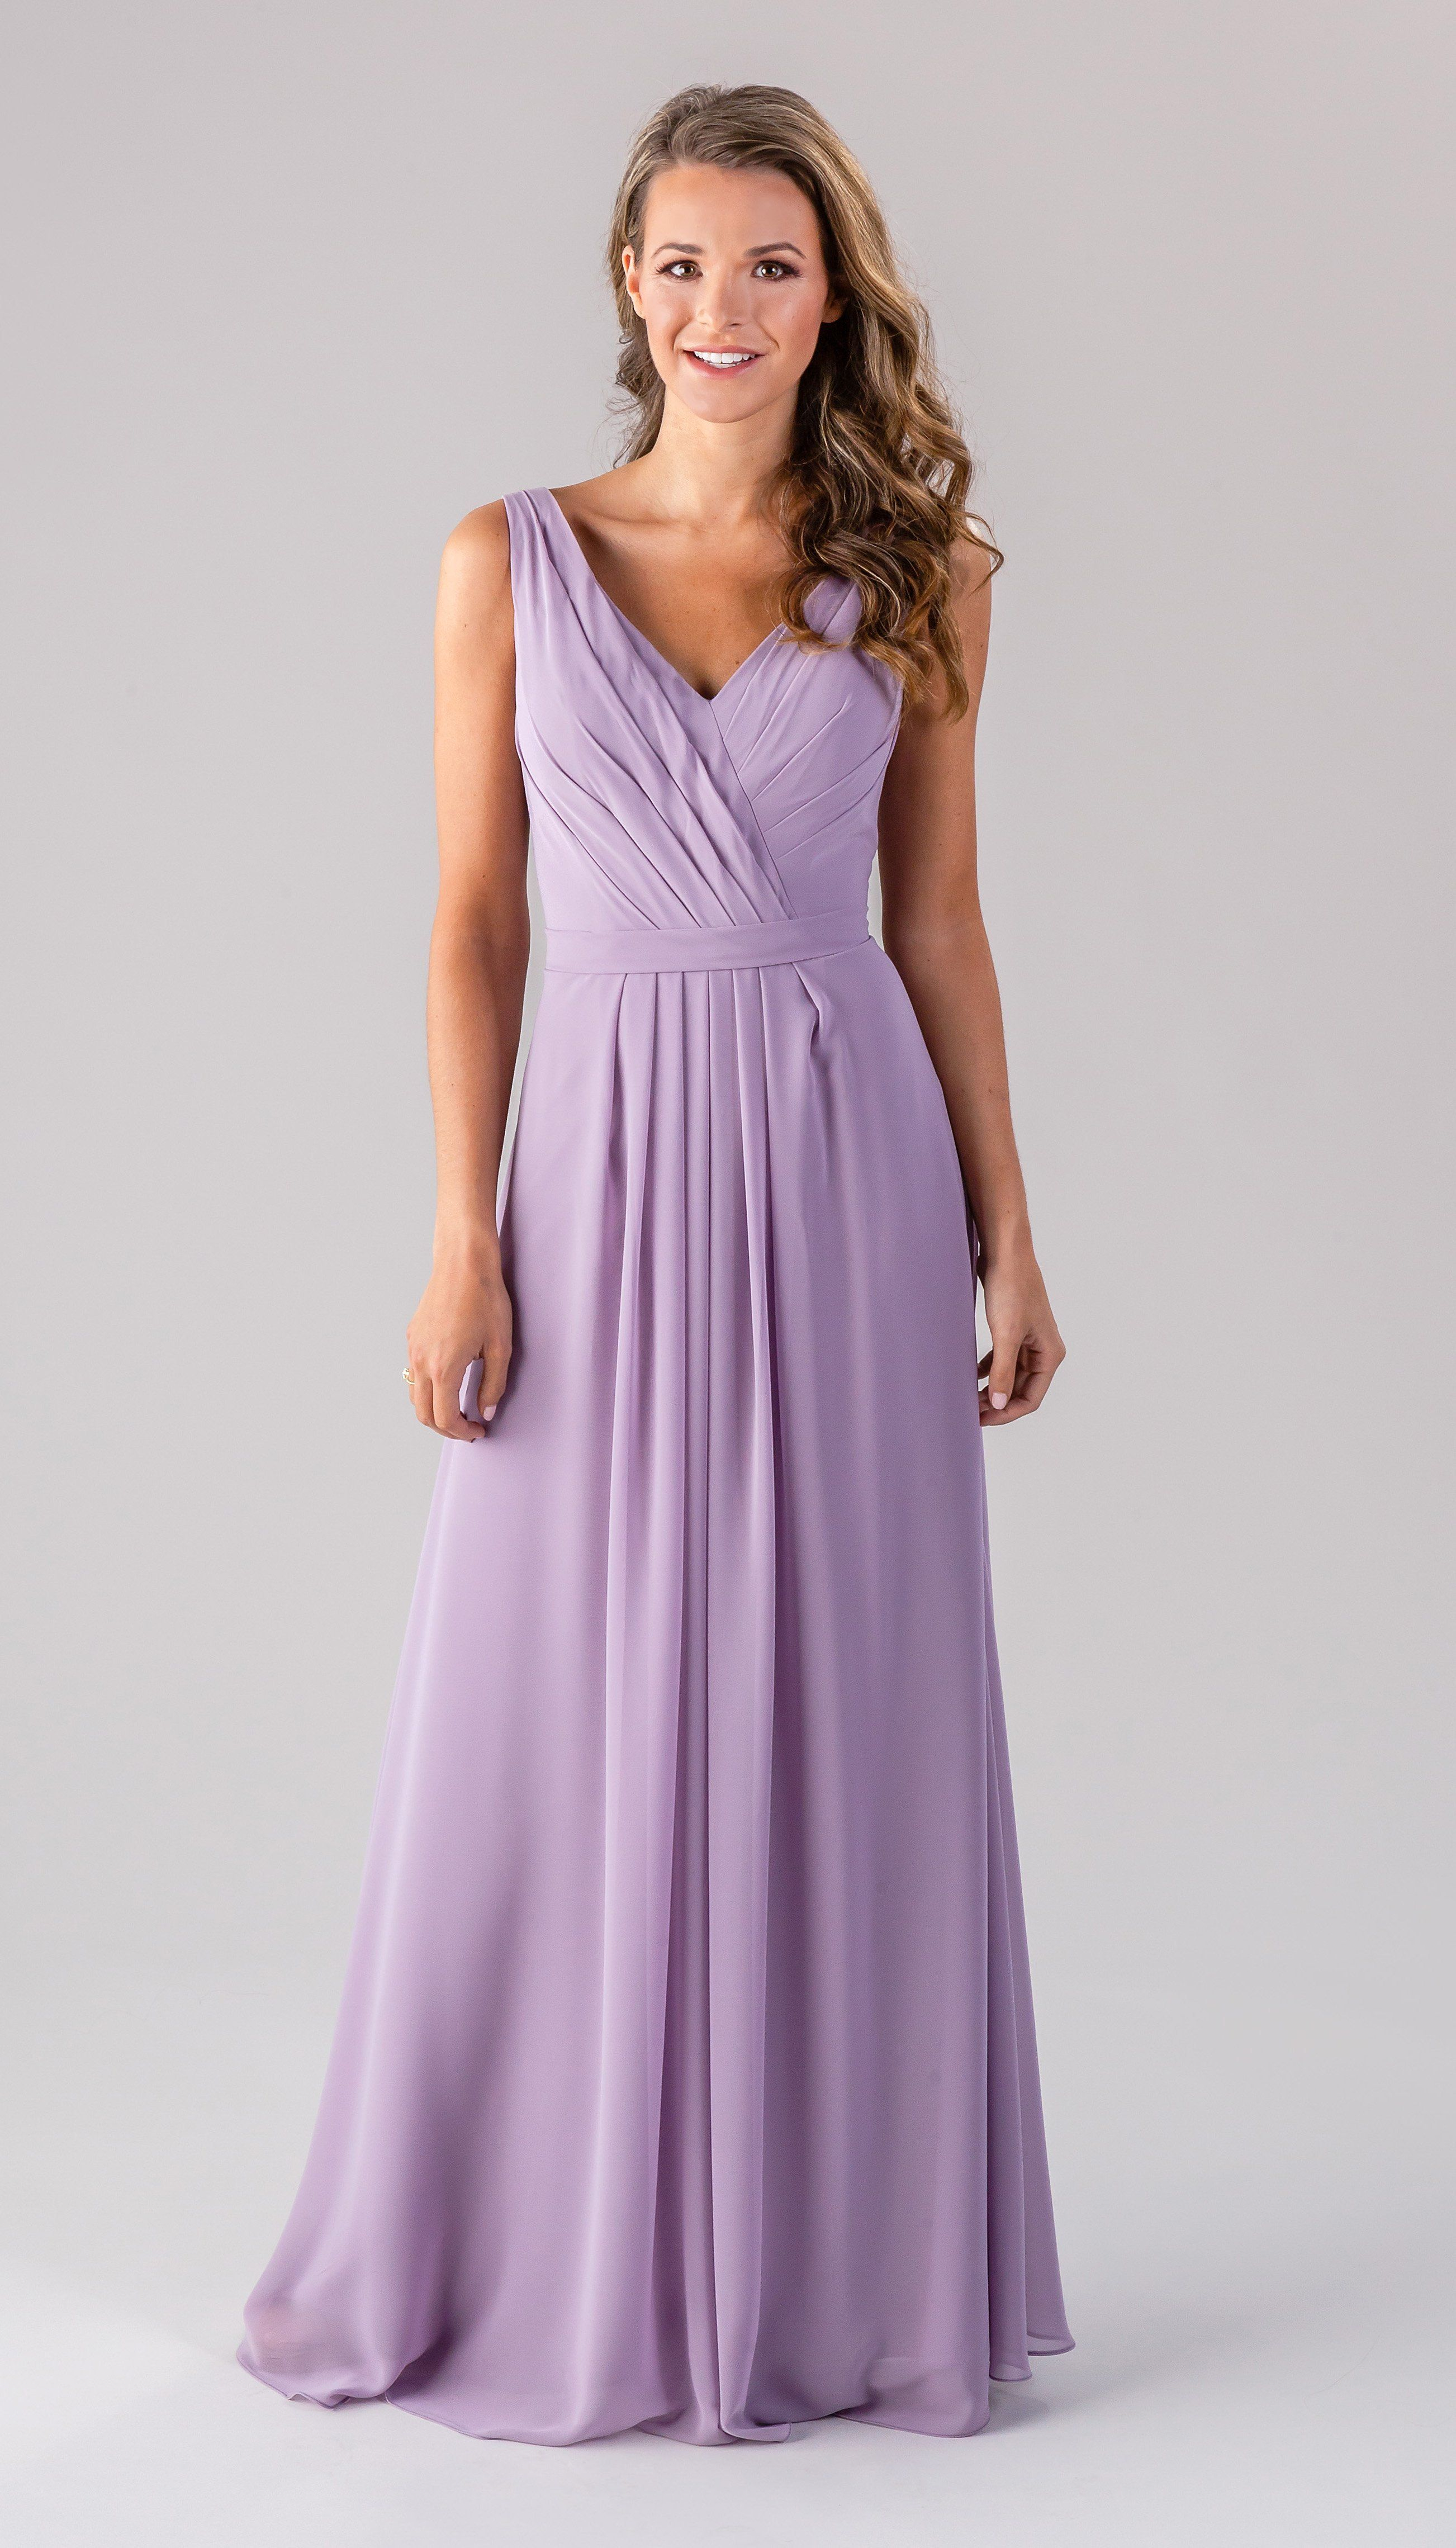 Amelia amelia classic bridesmaids dresses and wedding planning amelia v neck bridesmaid dresses ombrellifo Images